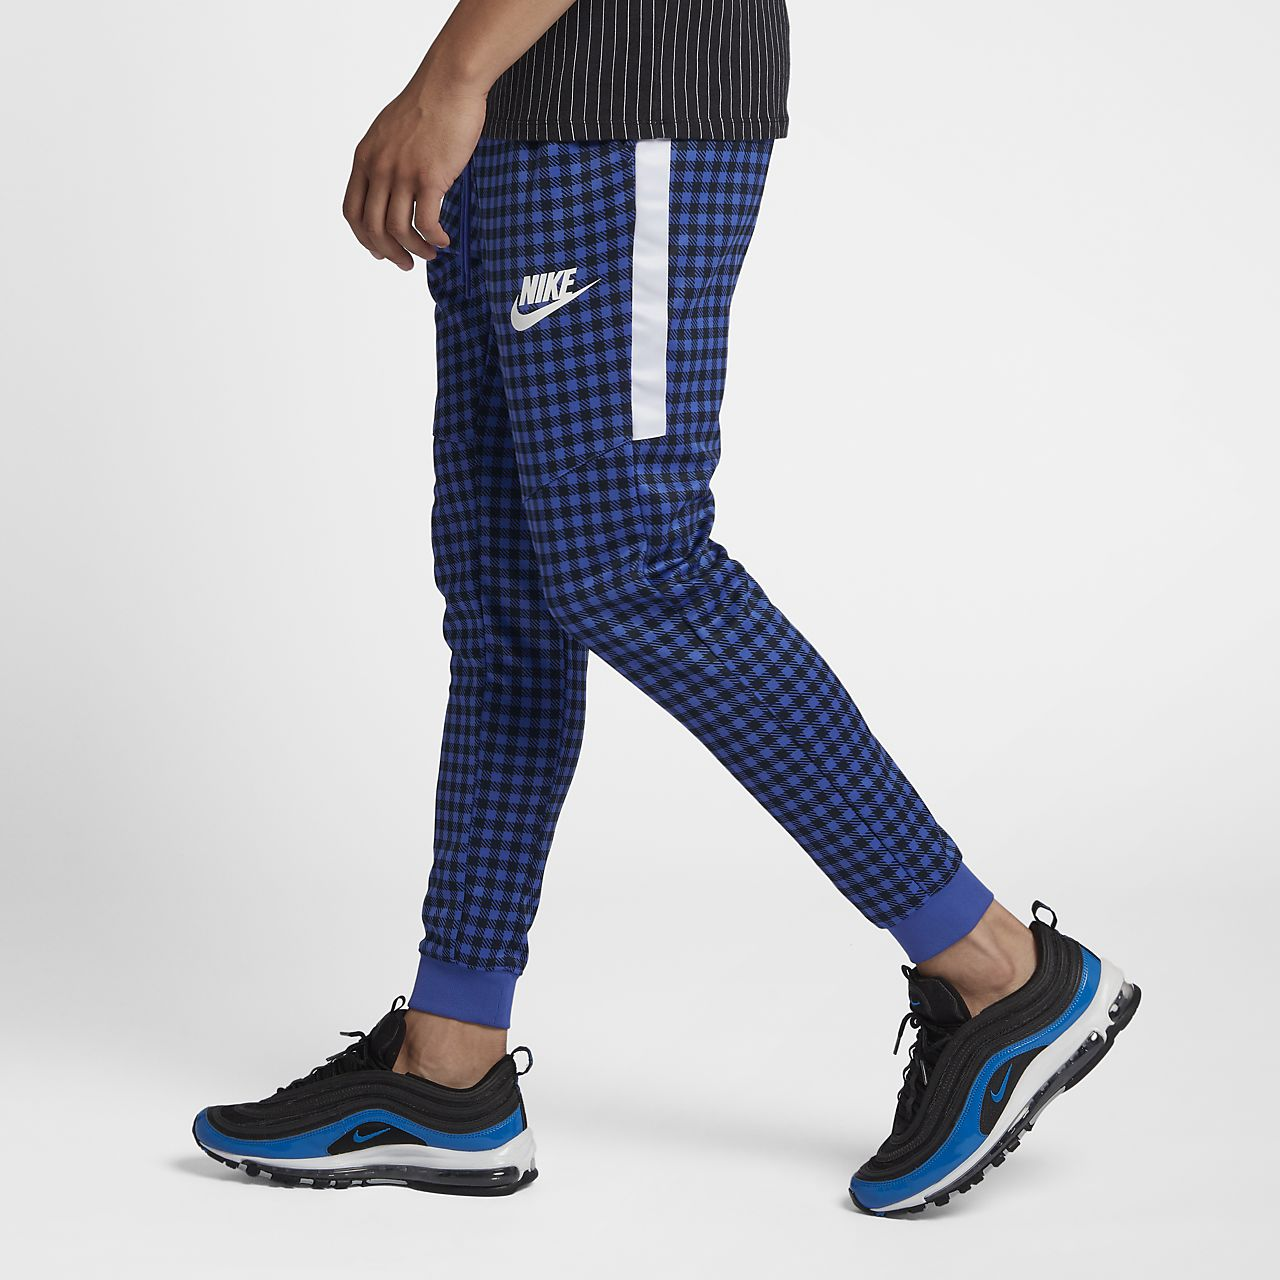 08dff6f450a158 Low Resolution Nike Sportswear Jogginghose mit Grafik Nike Sportswear  Jogginghose mit Grafik